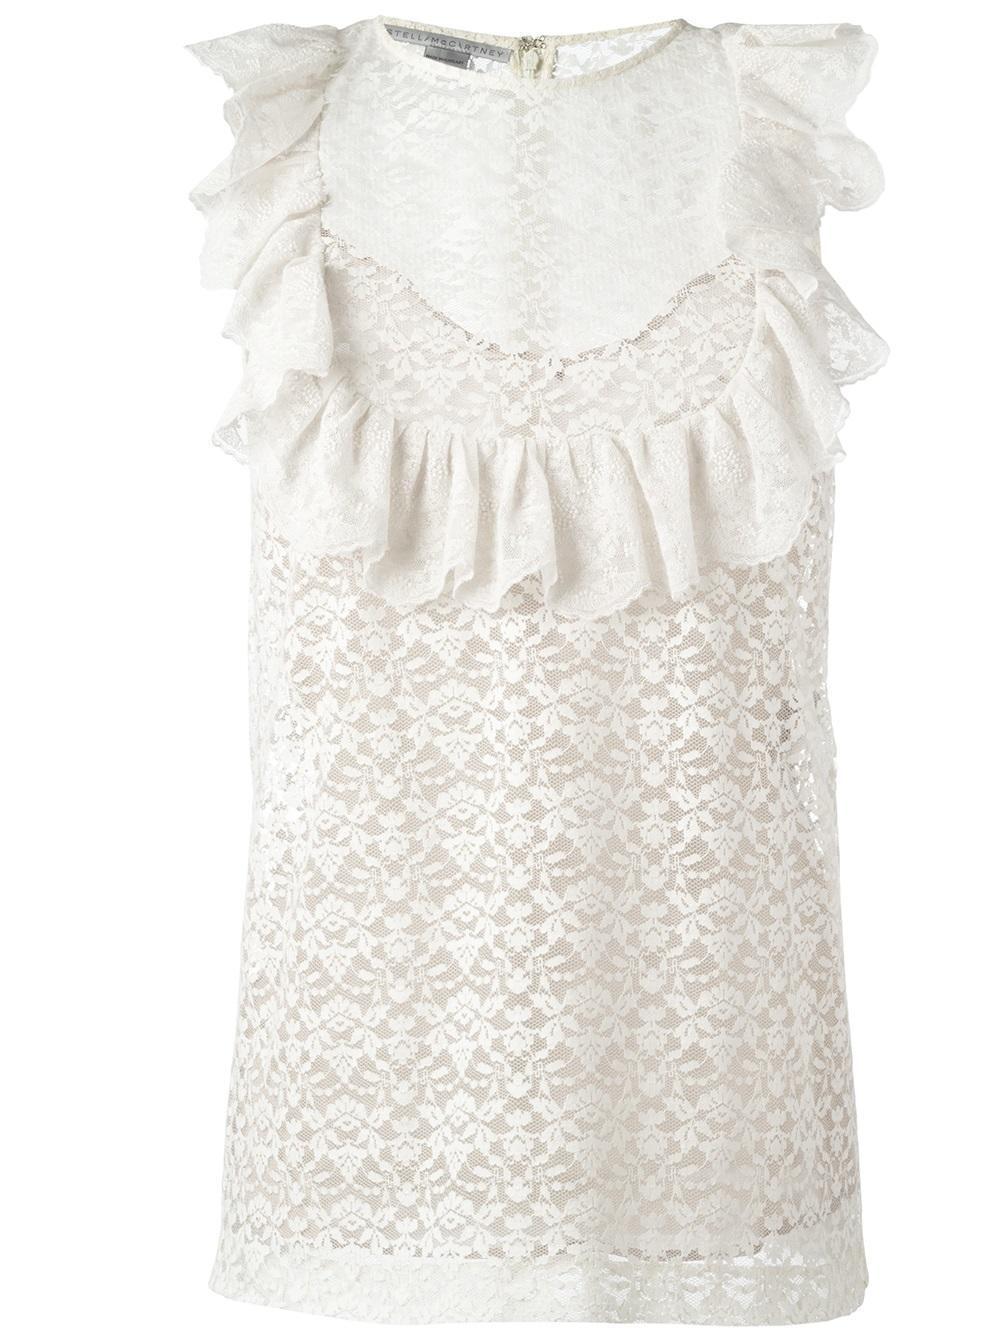 Stella mccartney lace blouse with ruffle US S - 4  IT 40  W TAGS